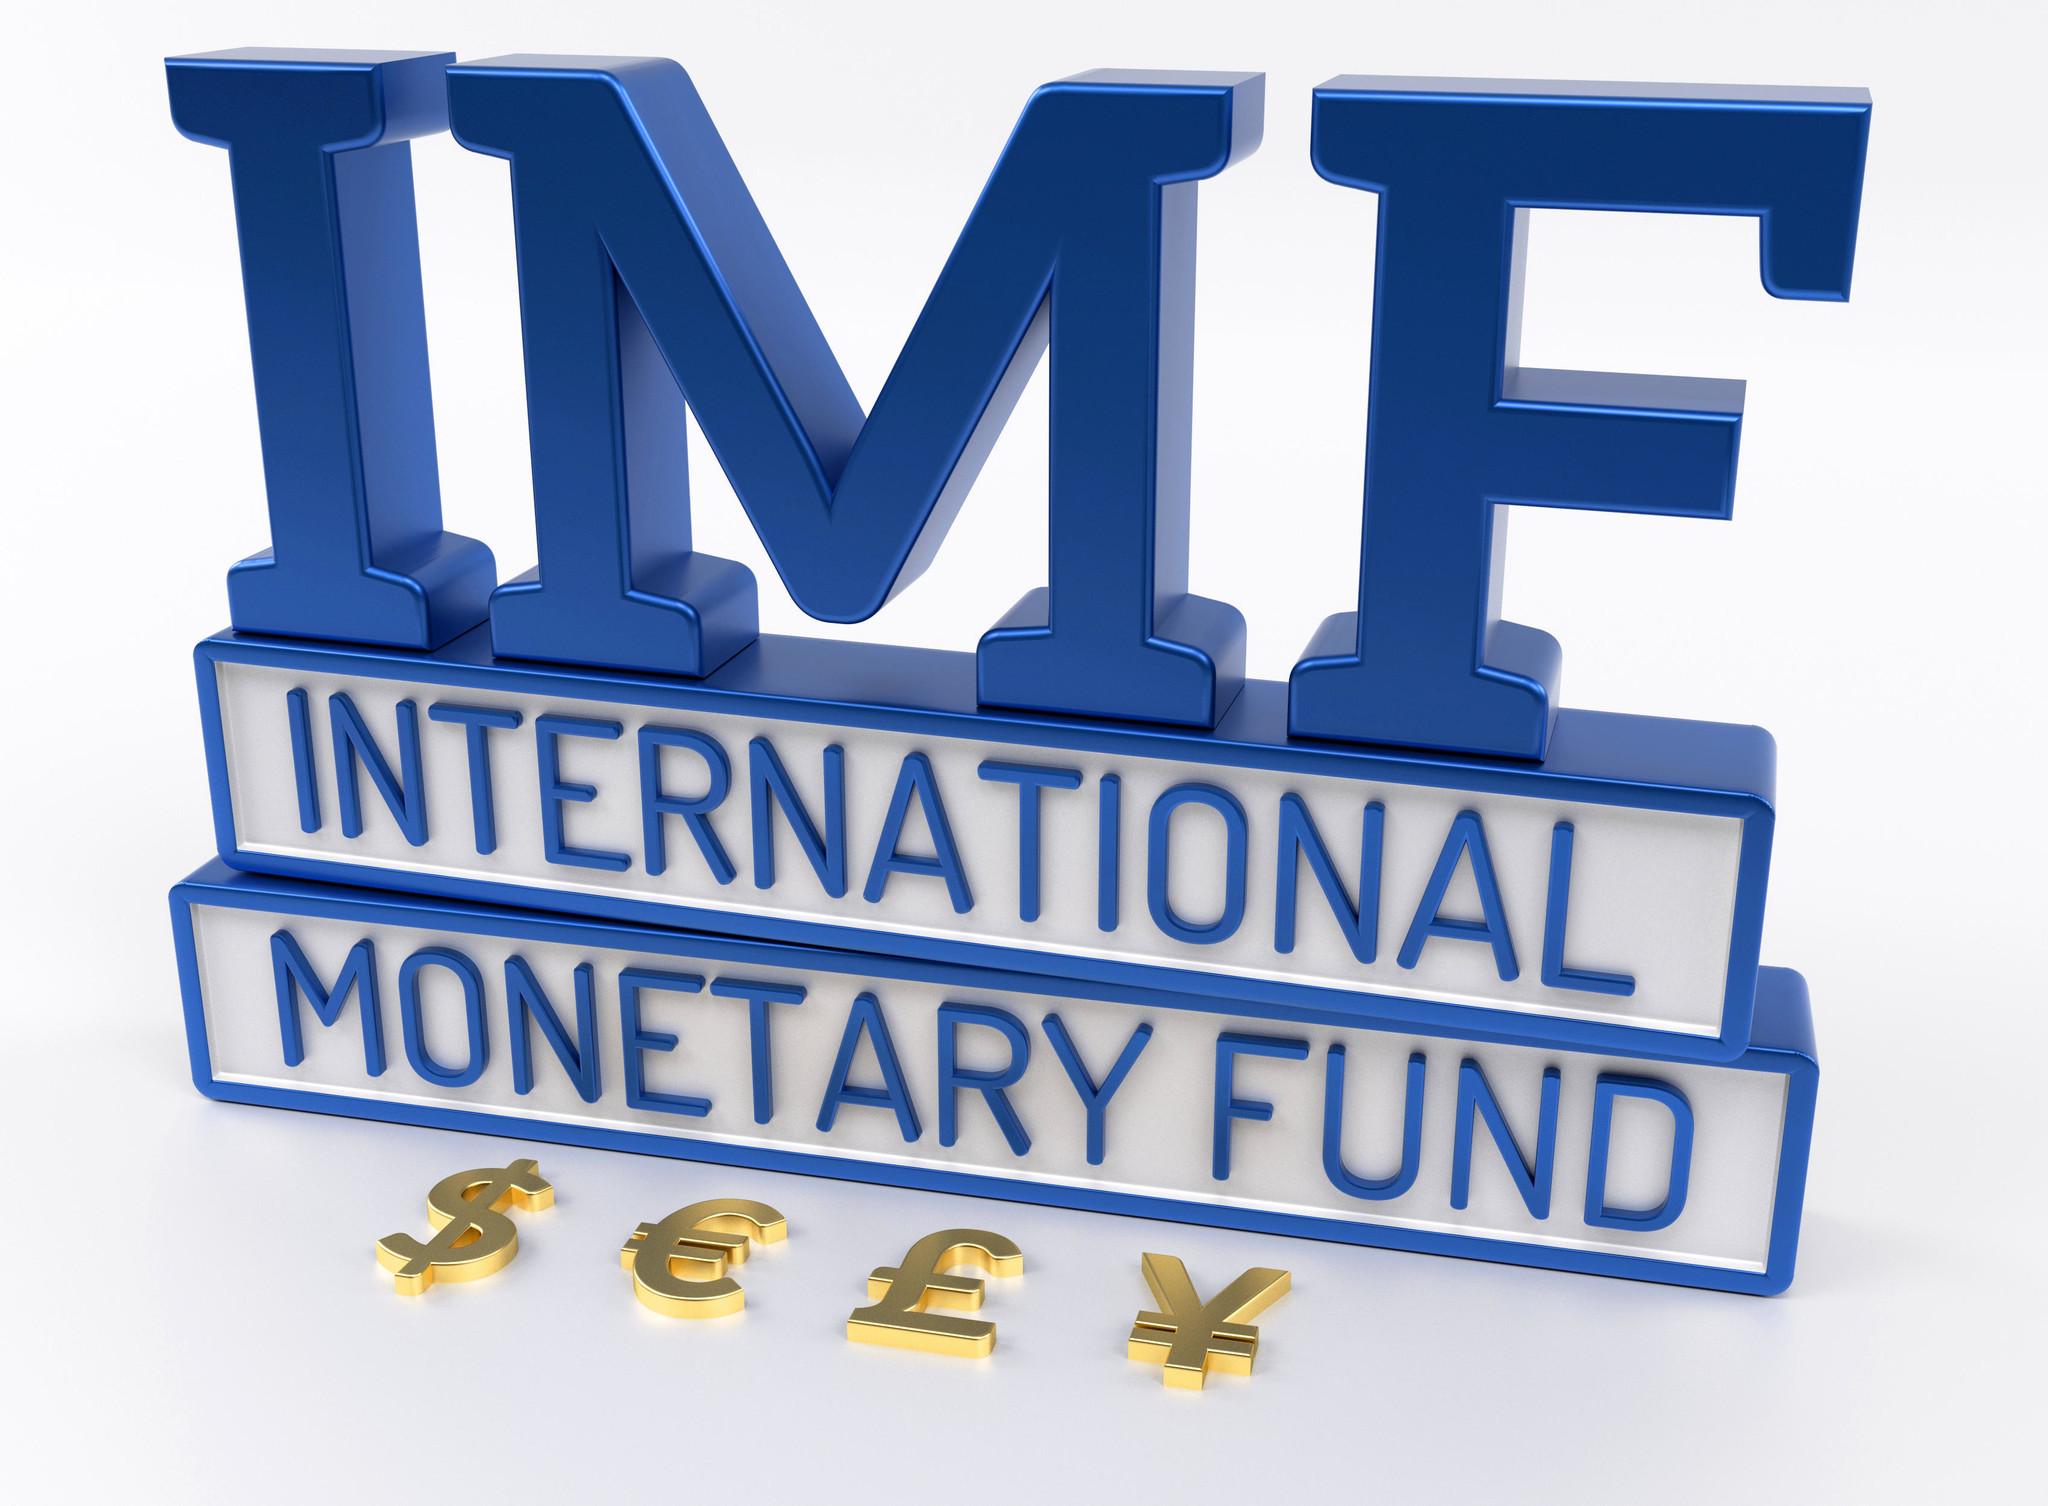 IMF减持挽救经济,黄金的抛售潮要来了吗